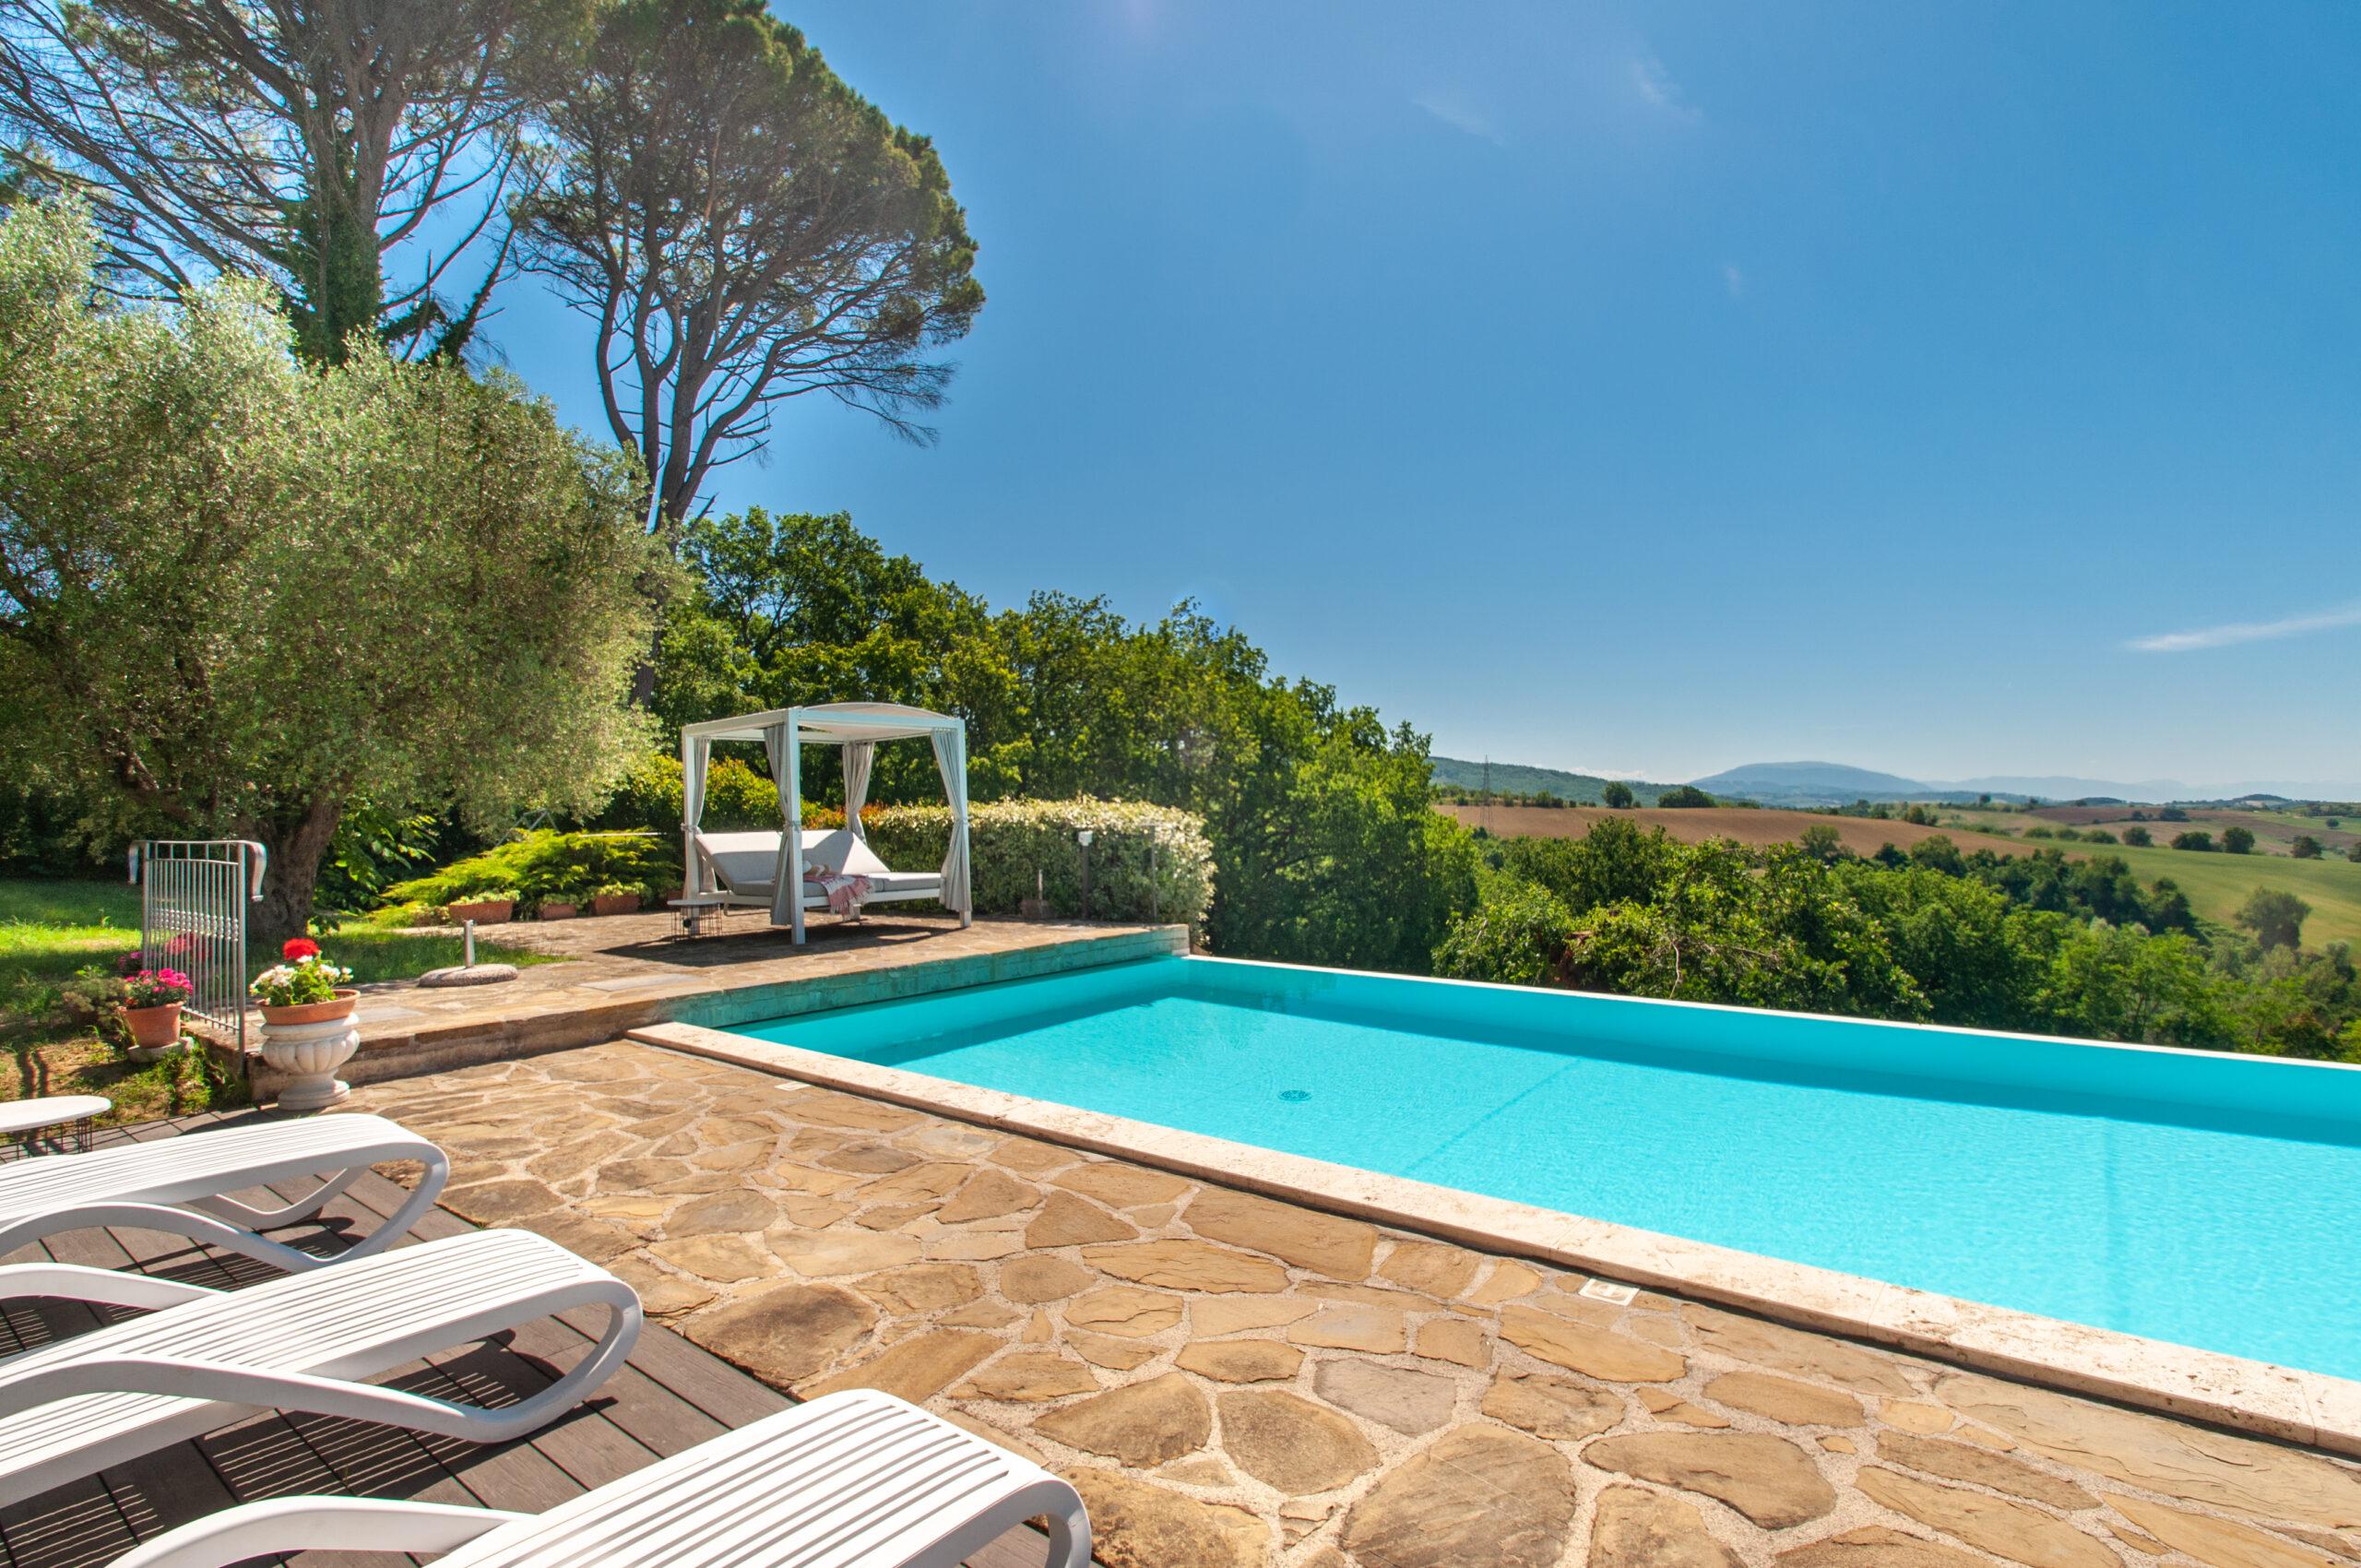 casa con piscina affitto esclusivo assisi